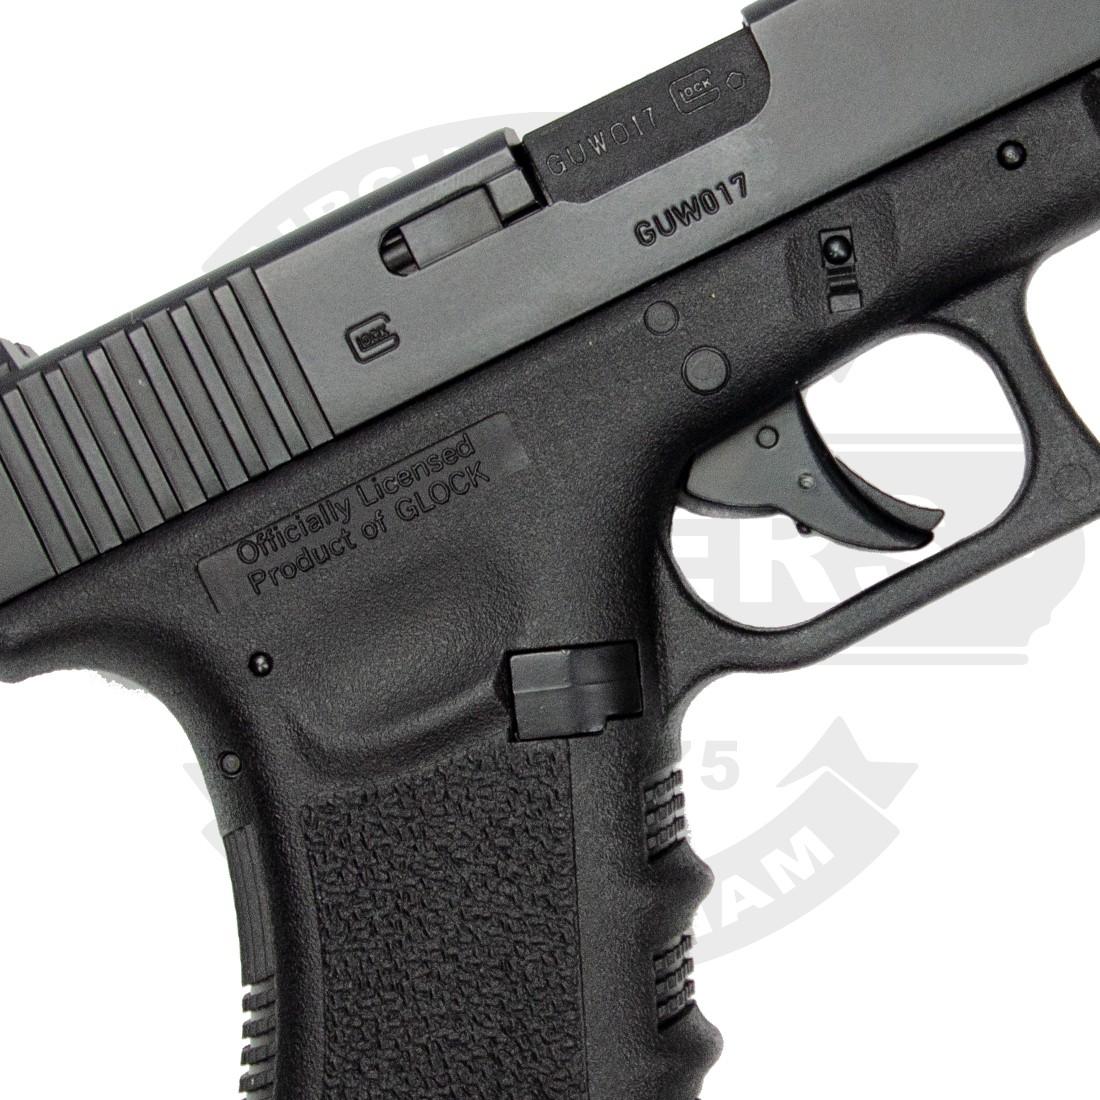 Umarex Glock 17 4 5mm BB - New Air Guns - Airguns